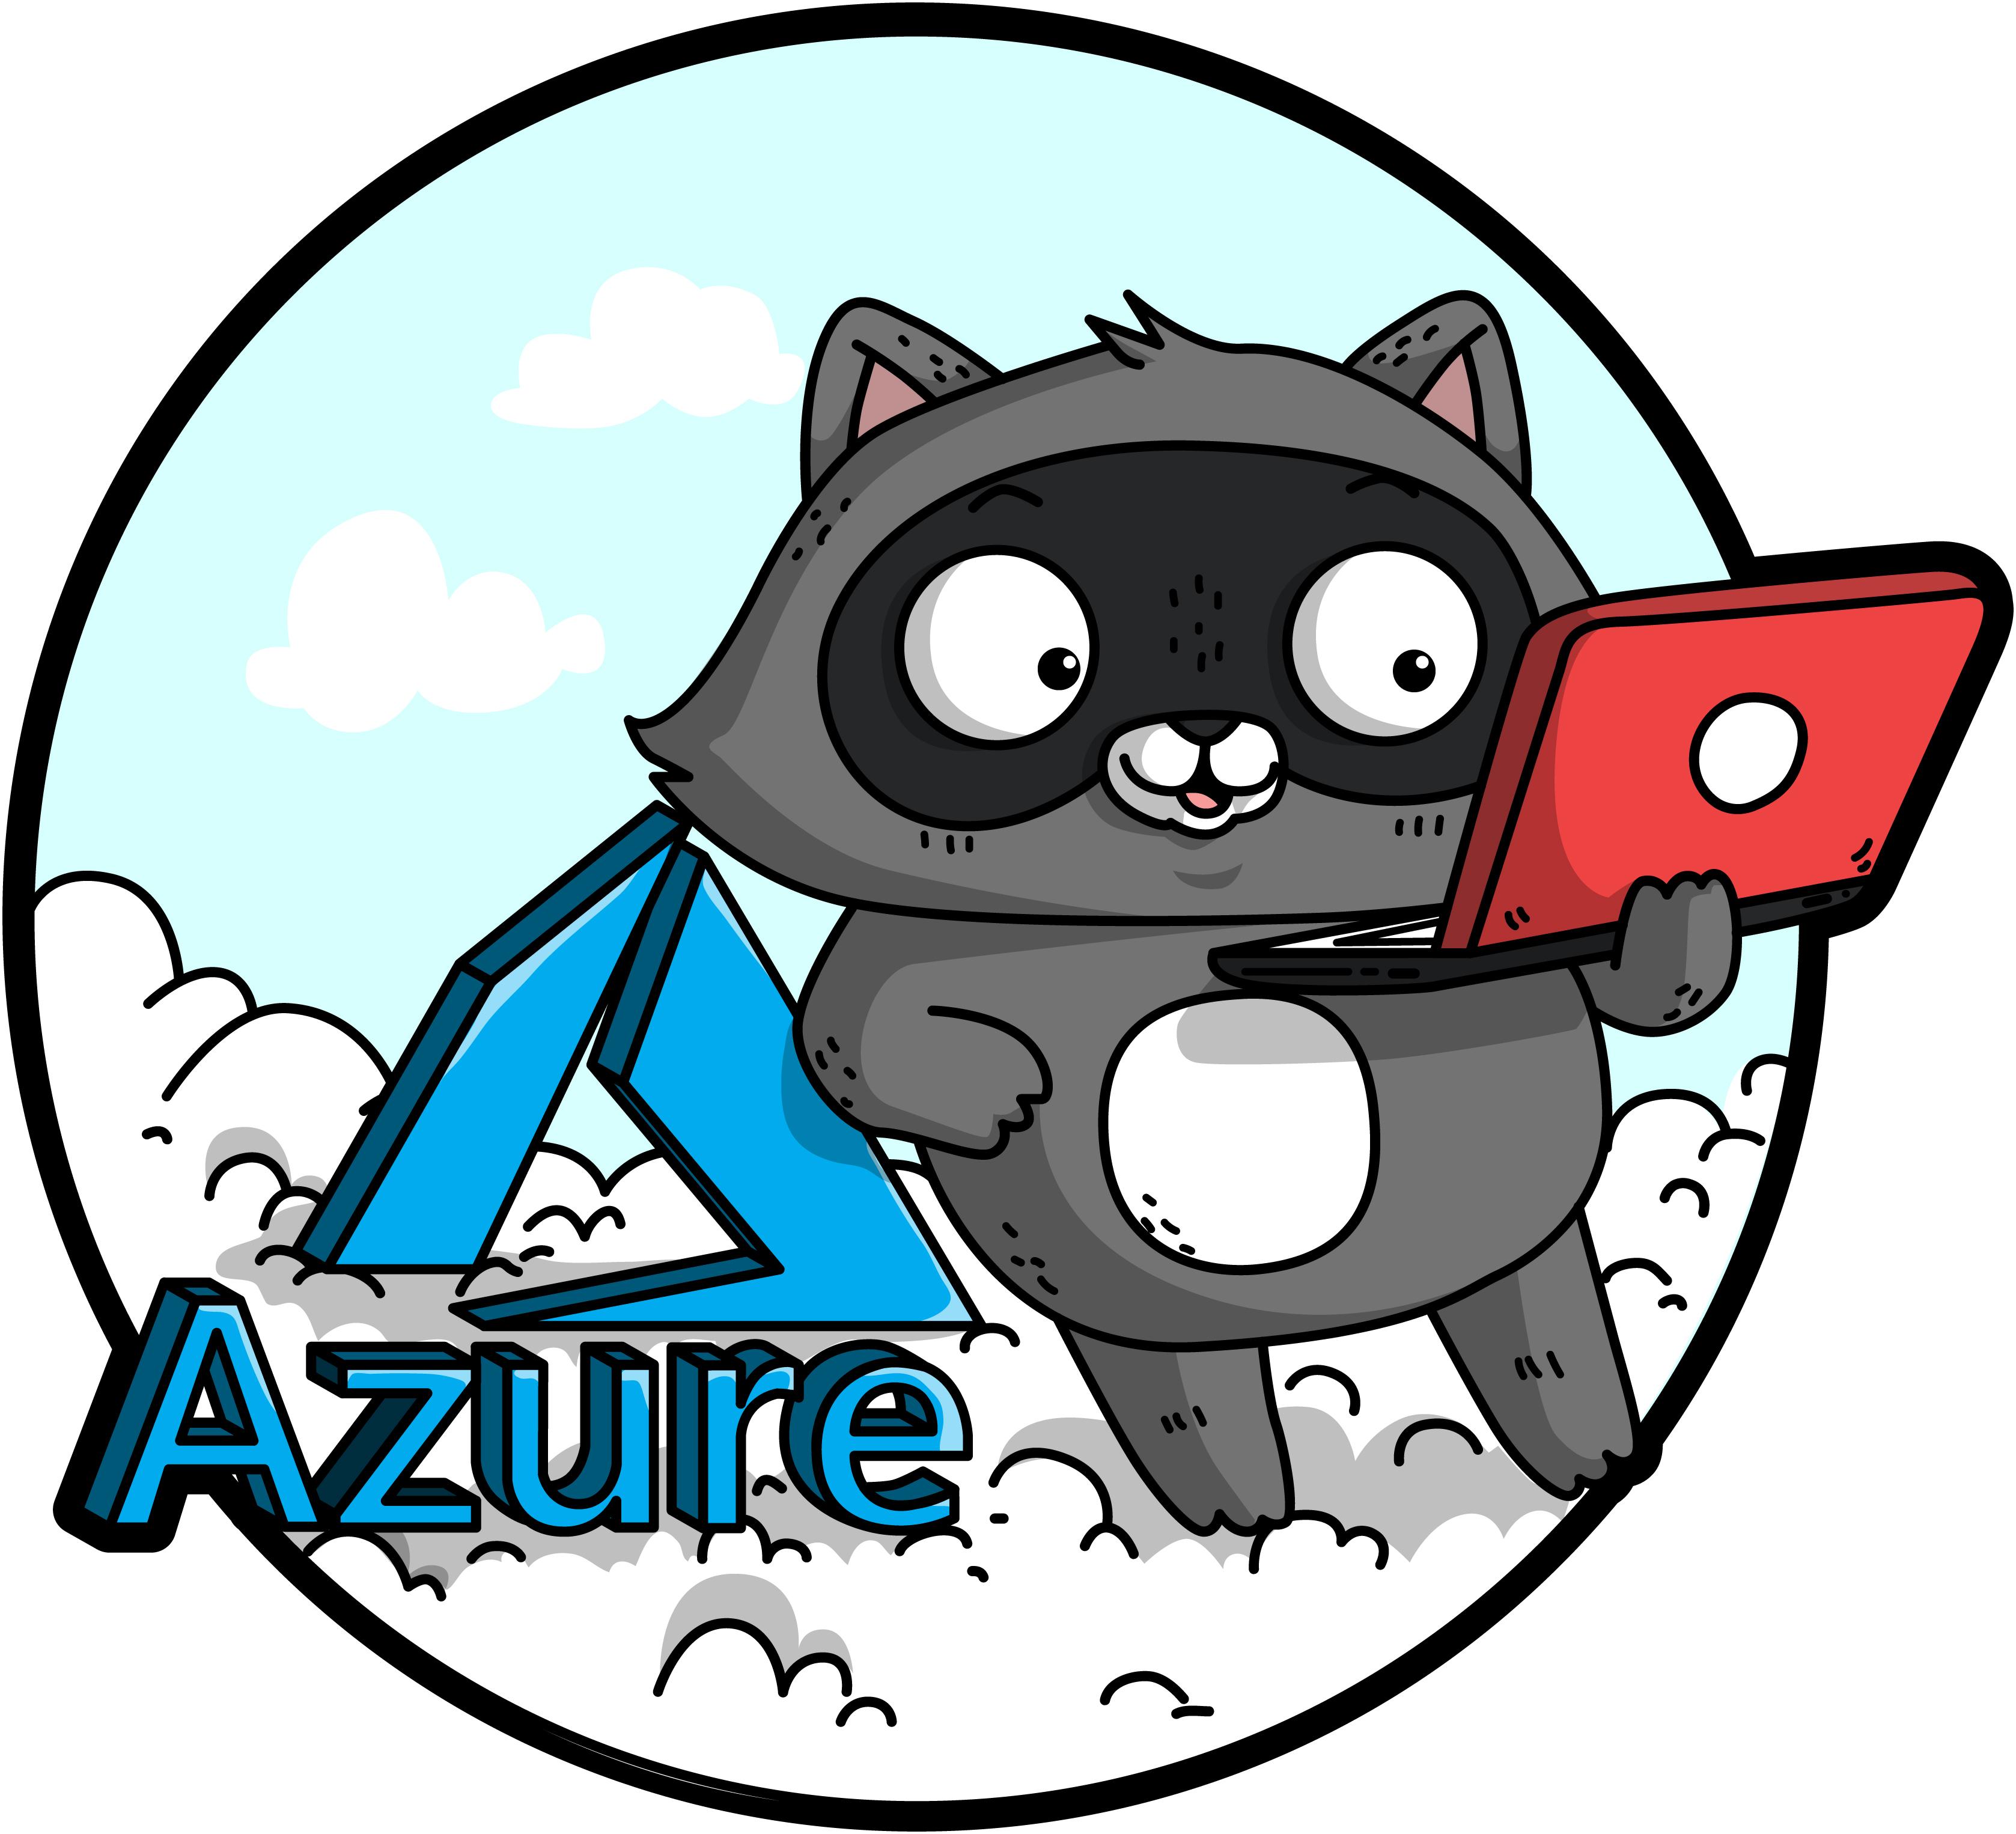 Azure Advocates